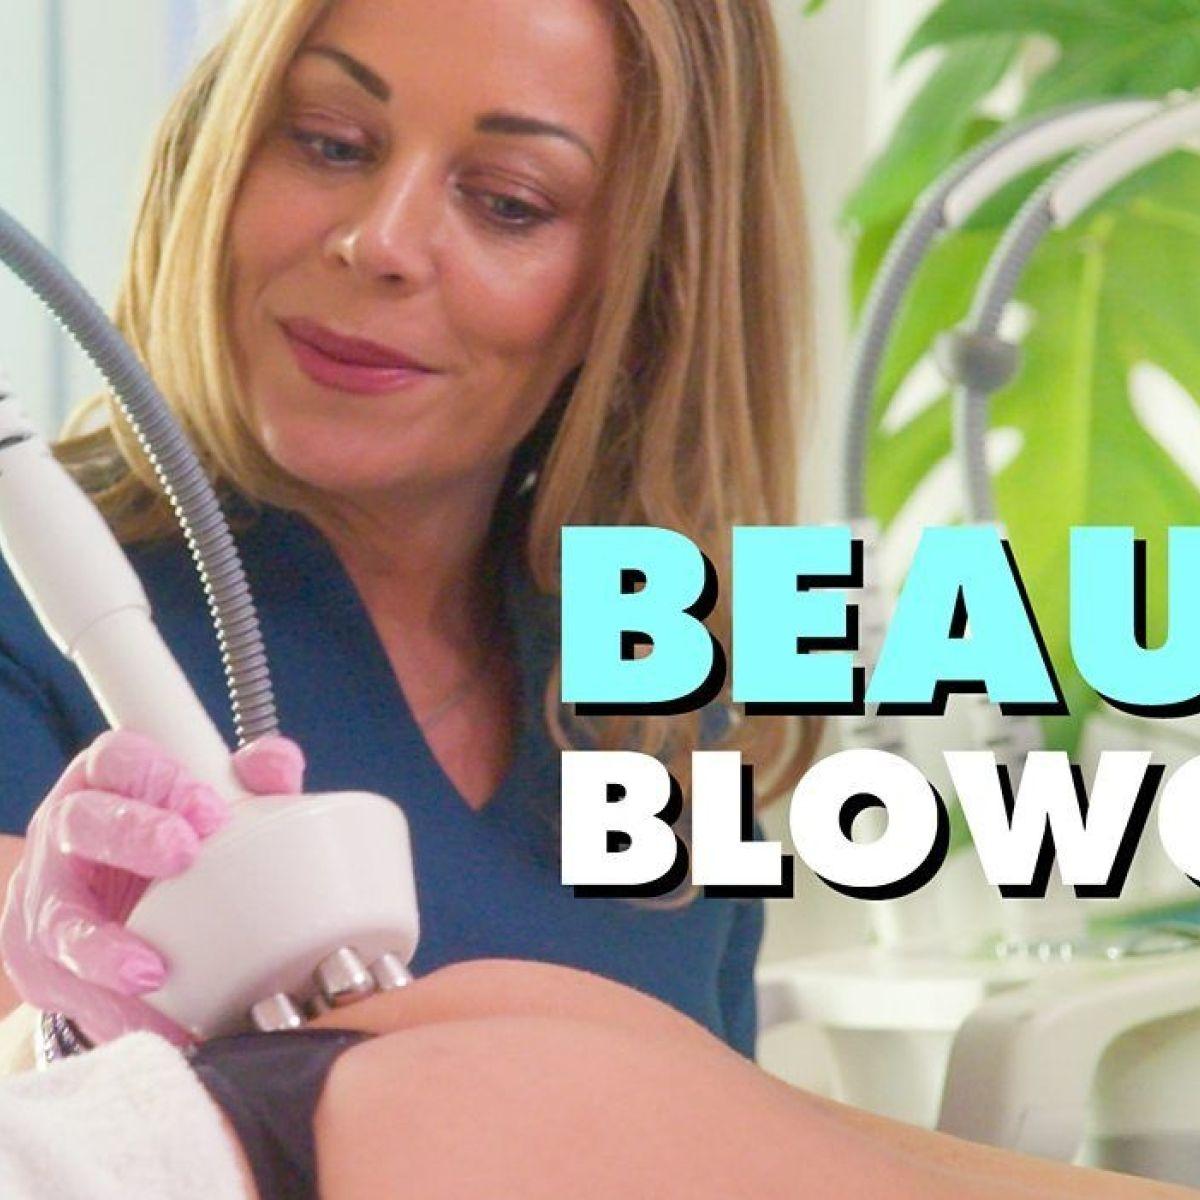 Beauty Blowout: Liverpudlians take beautification deadly